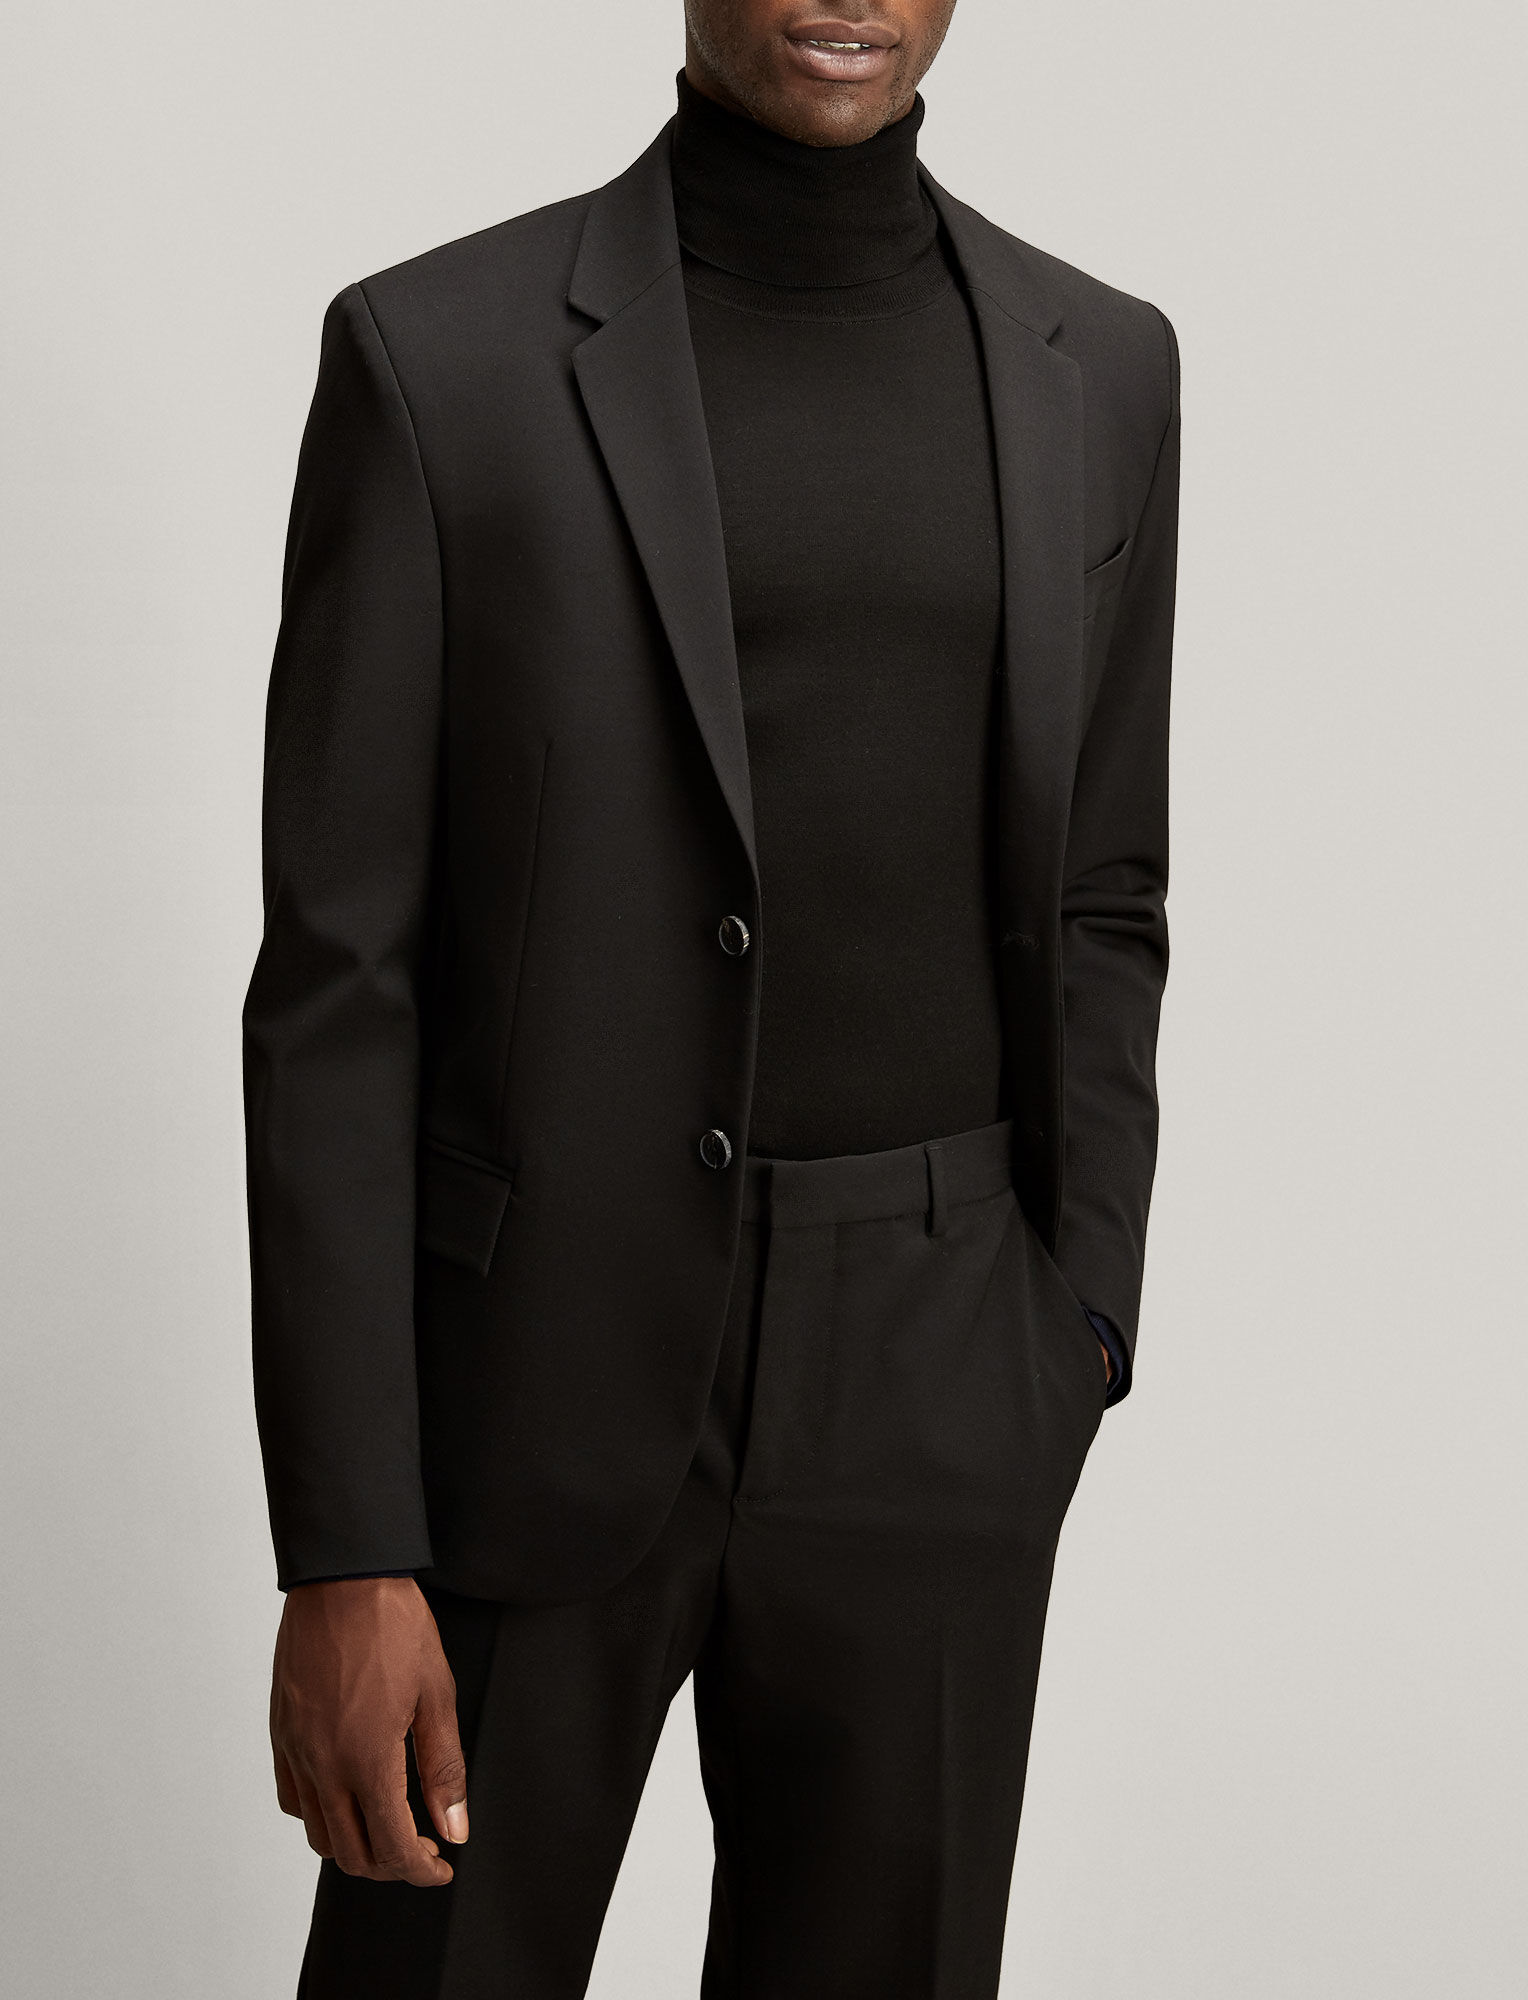 Joseph, Reading Techno Wool Stretch Jacket, in BLACK